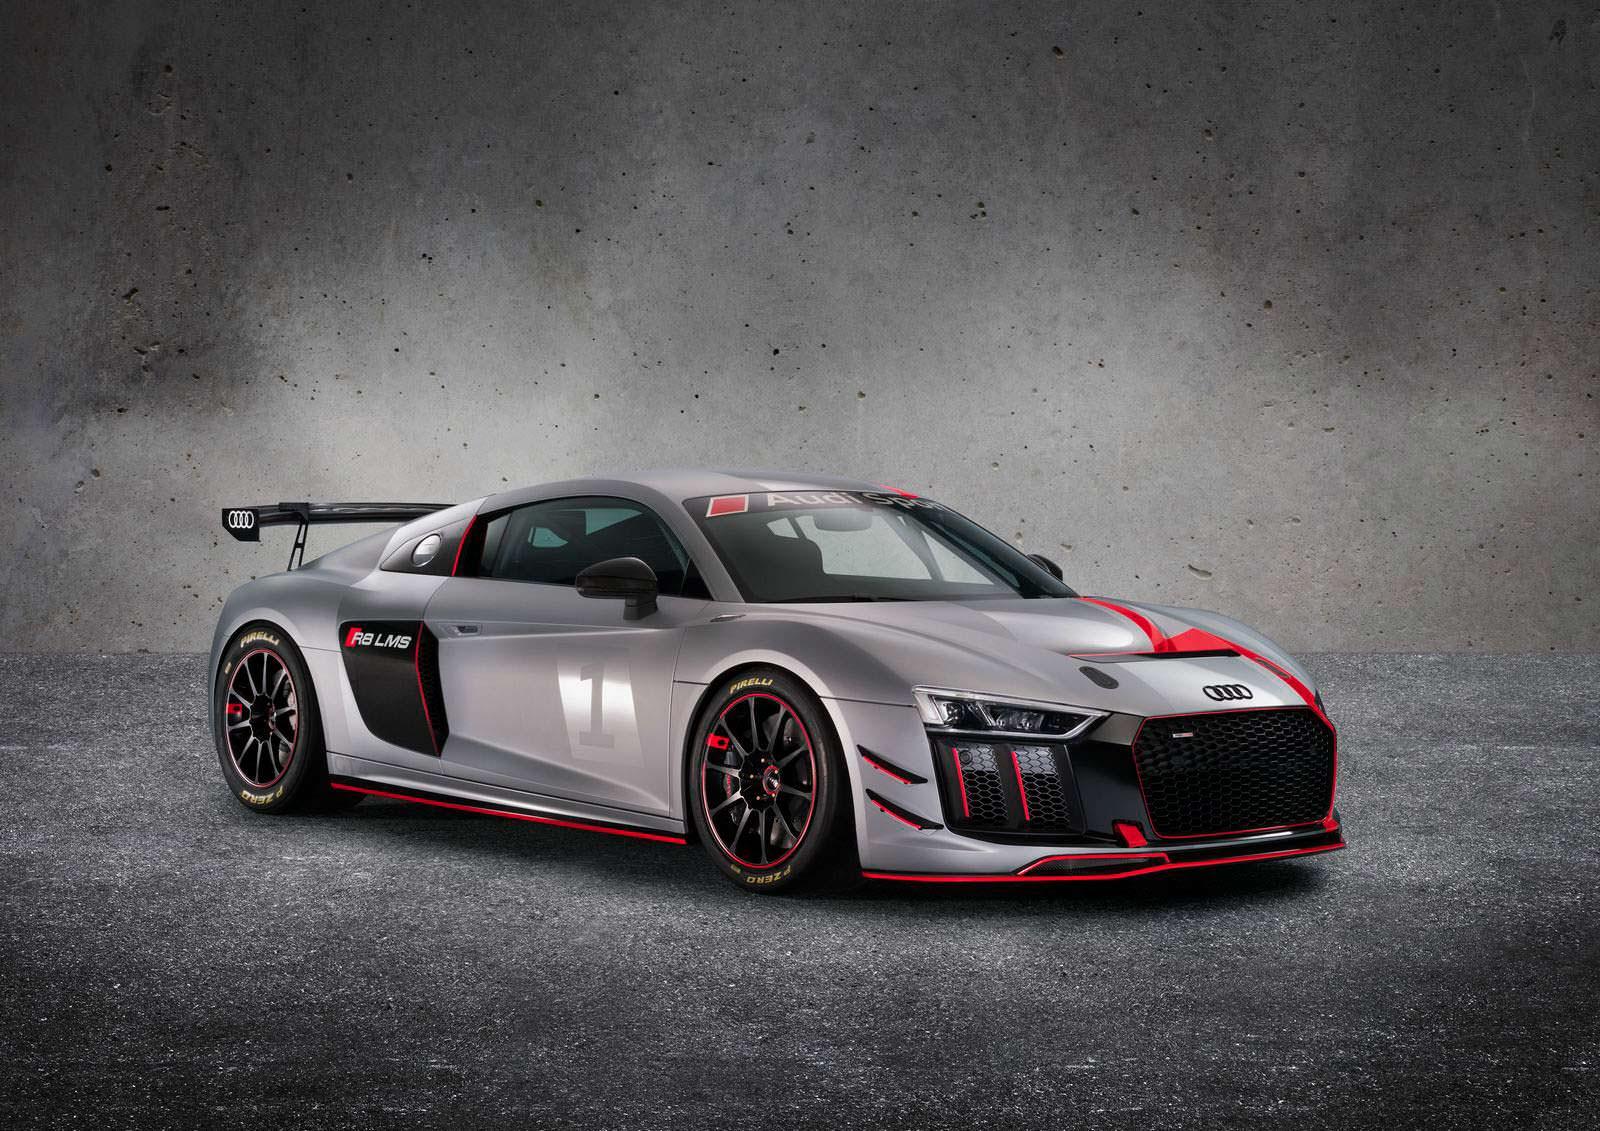 Фото   Audi R8 LMS GT4: суперкар для гонок на выносливость